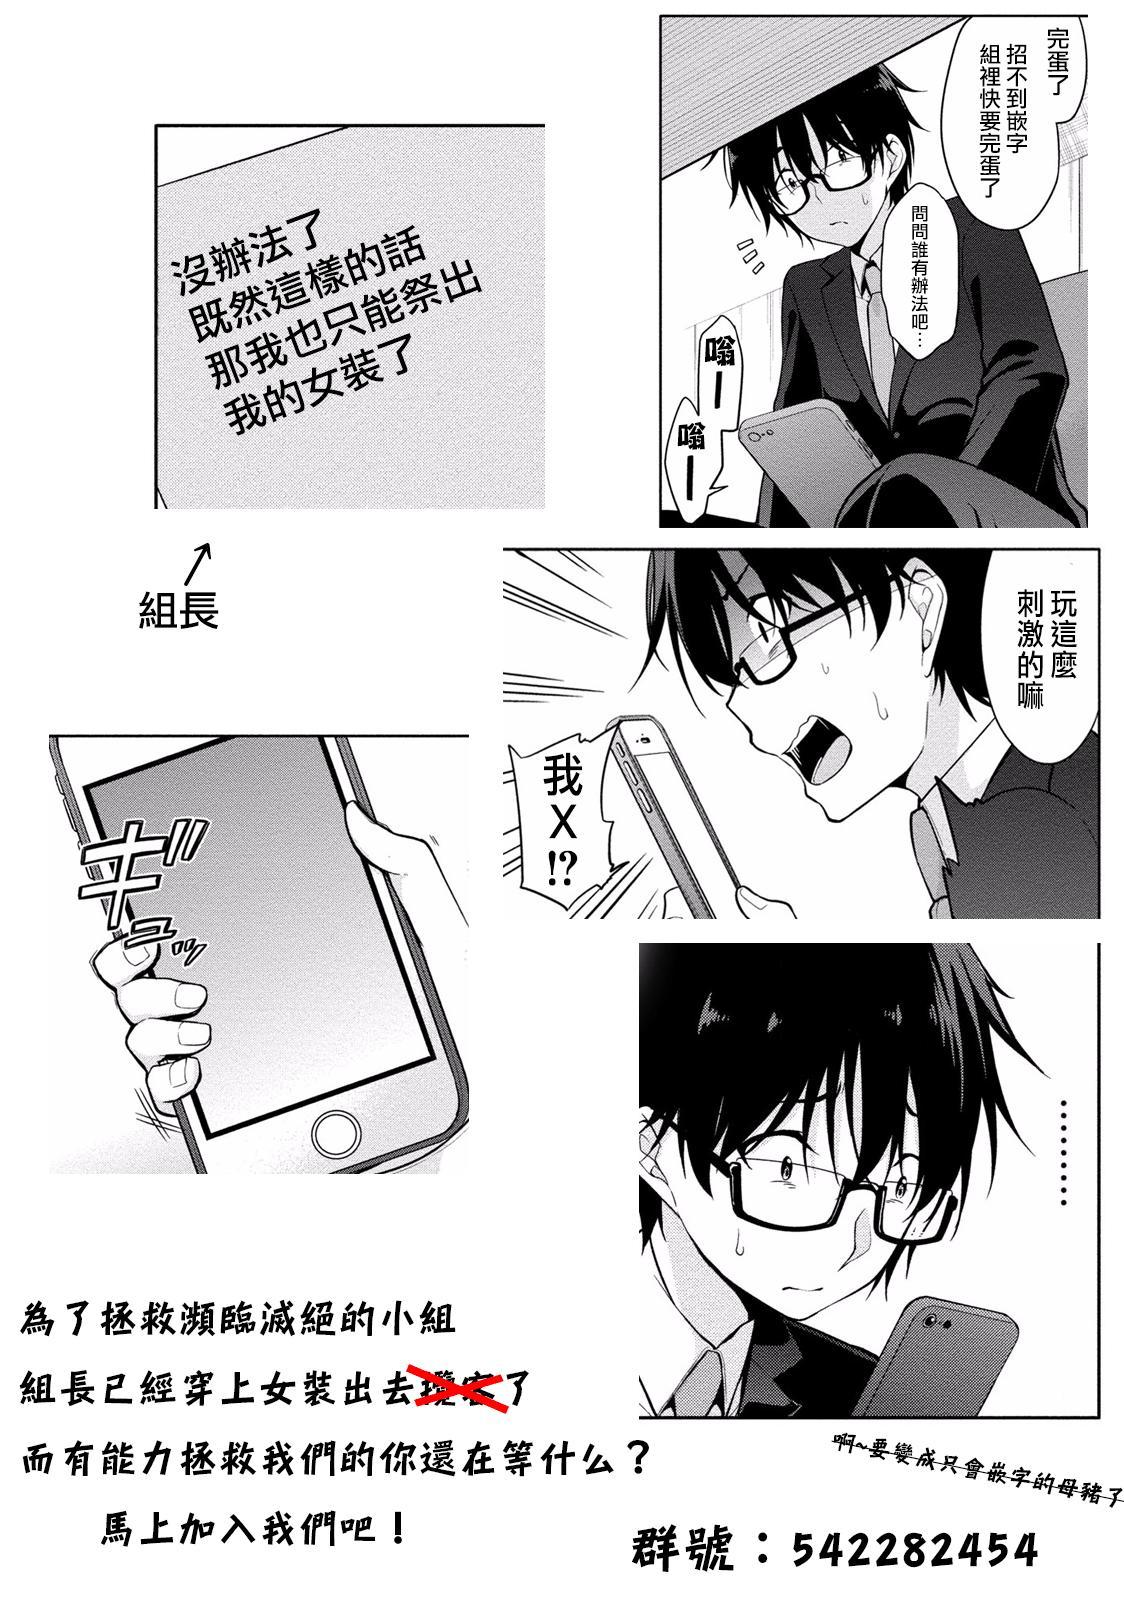 [Yukino] Satou-kun wa Miteiru. ~Kami-sama Appli de Onnanoko no Kokoro o Nozoitara Do XX datta~ Ch. 2 | 佐藤君正在偷窥。~用神大人的APP偷窥女孩子的内心却发现原来是抖XX~02话 [Chinese] [前线作♂战♀基地] 21